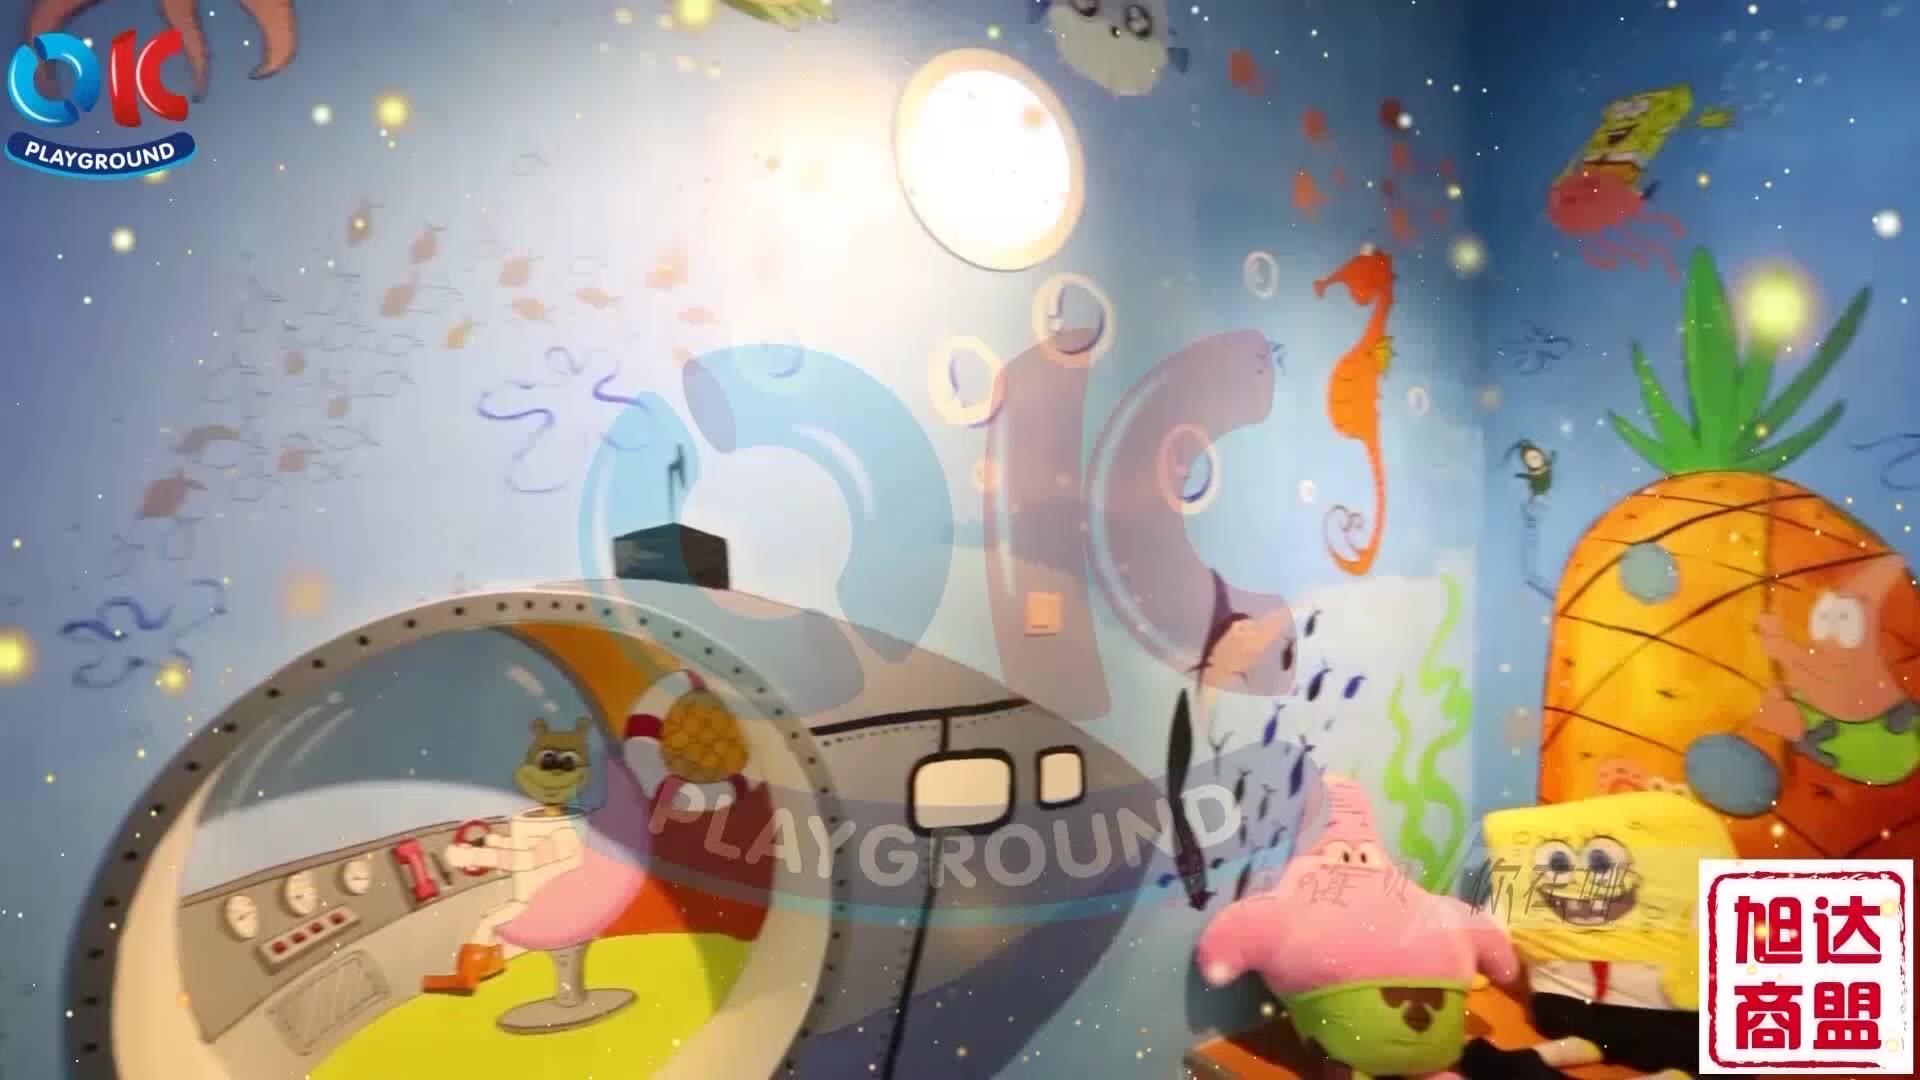 ODM OEM ילד מבנה אזור פעוט לטפס סט משחקים ילד מקורה רך לשחק נושא ציוד עבור תינוק